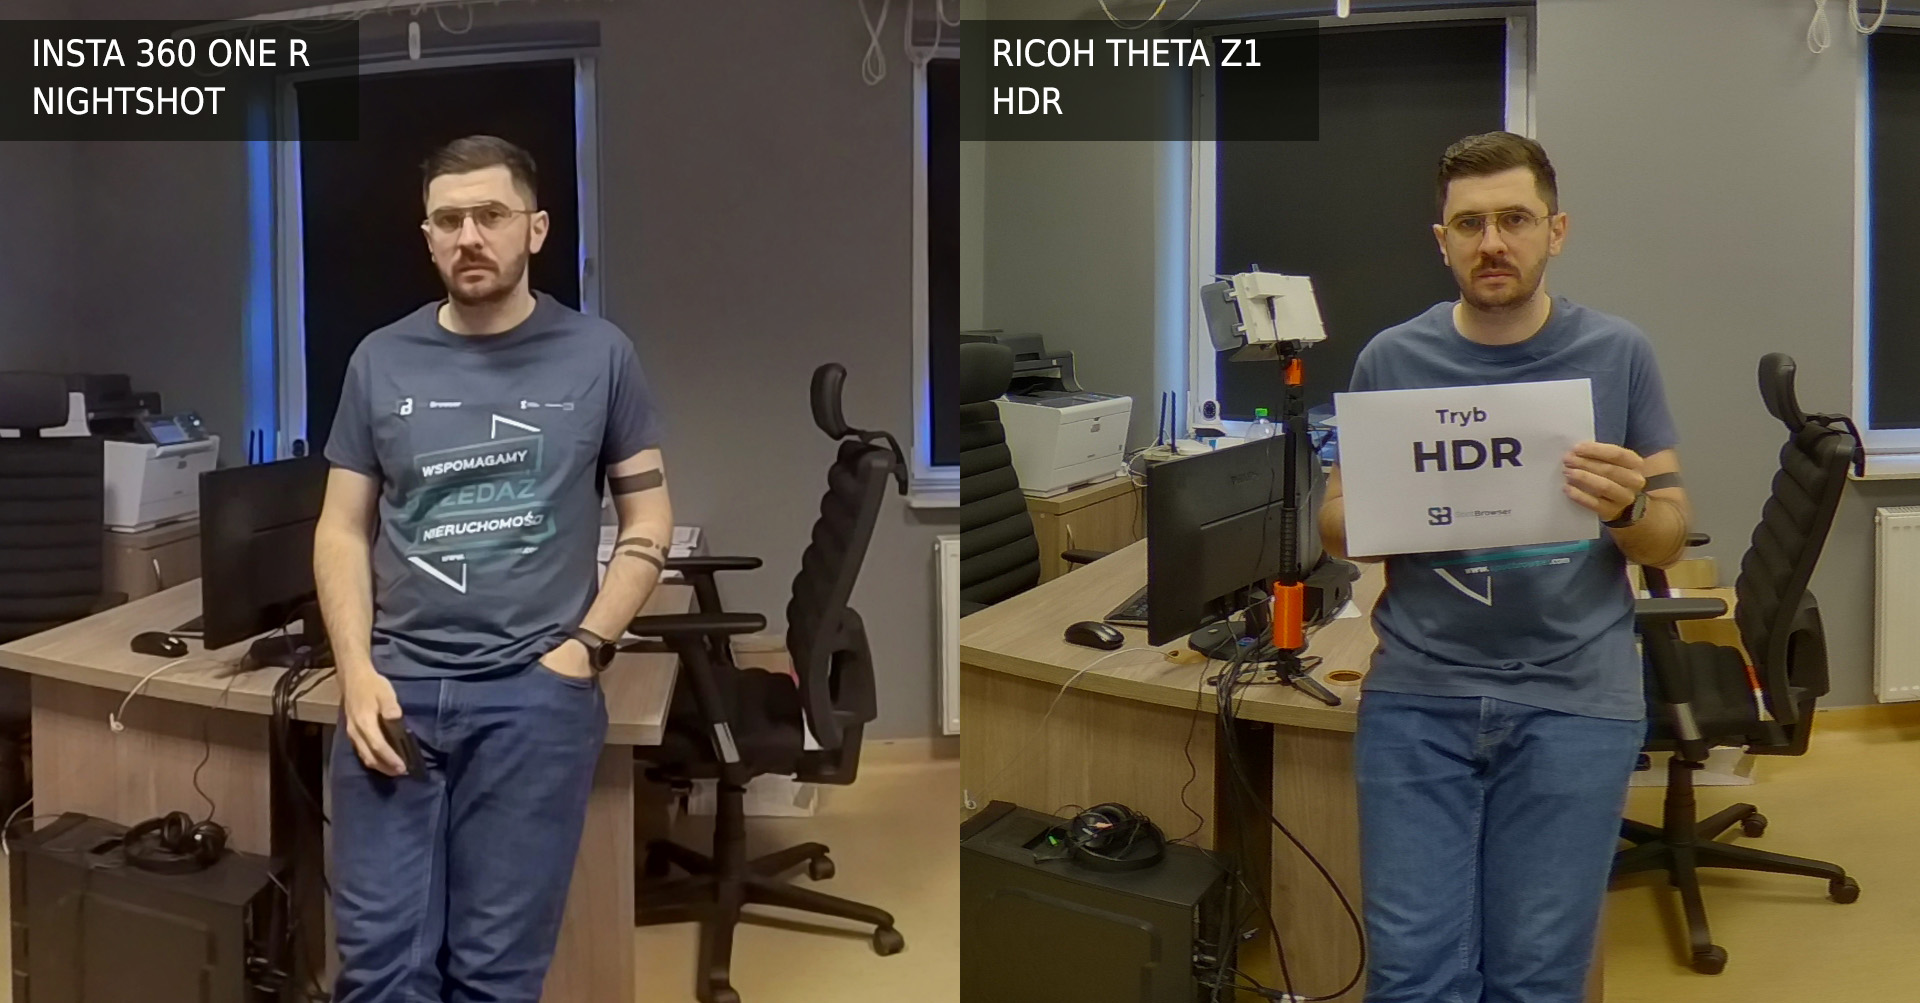 Ricoh Theta Z1 vs Insta 360 One R NightShot vs HDR